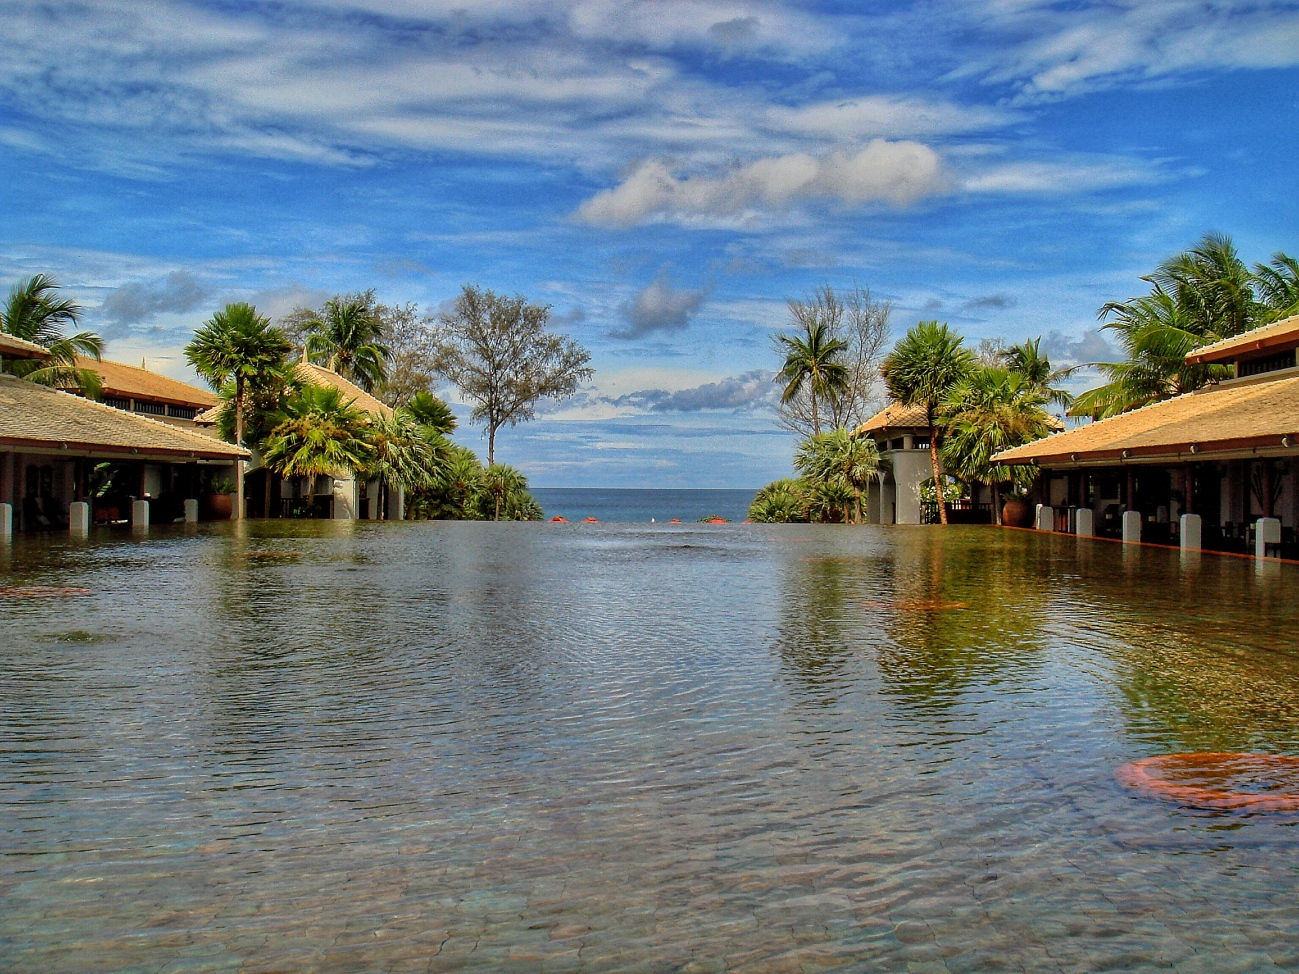 ReflectionPool - JW Marriott Phuket